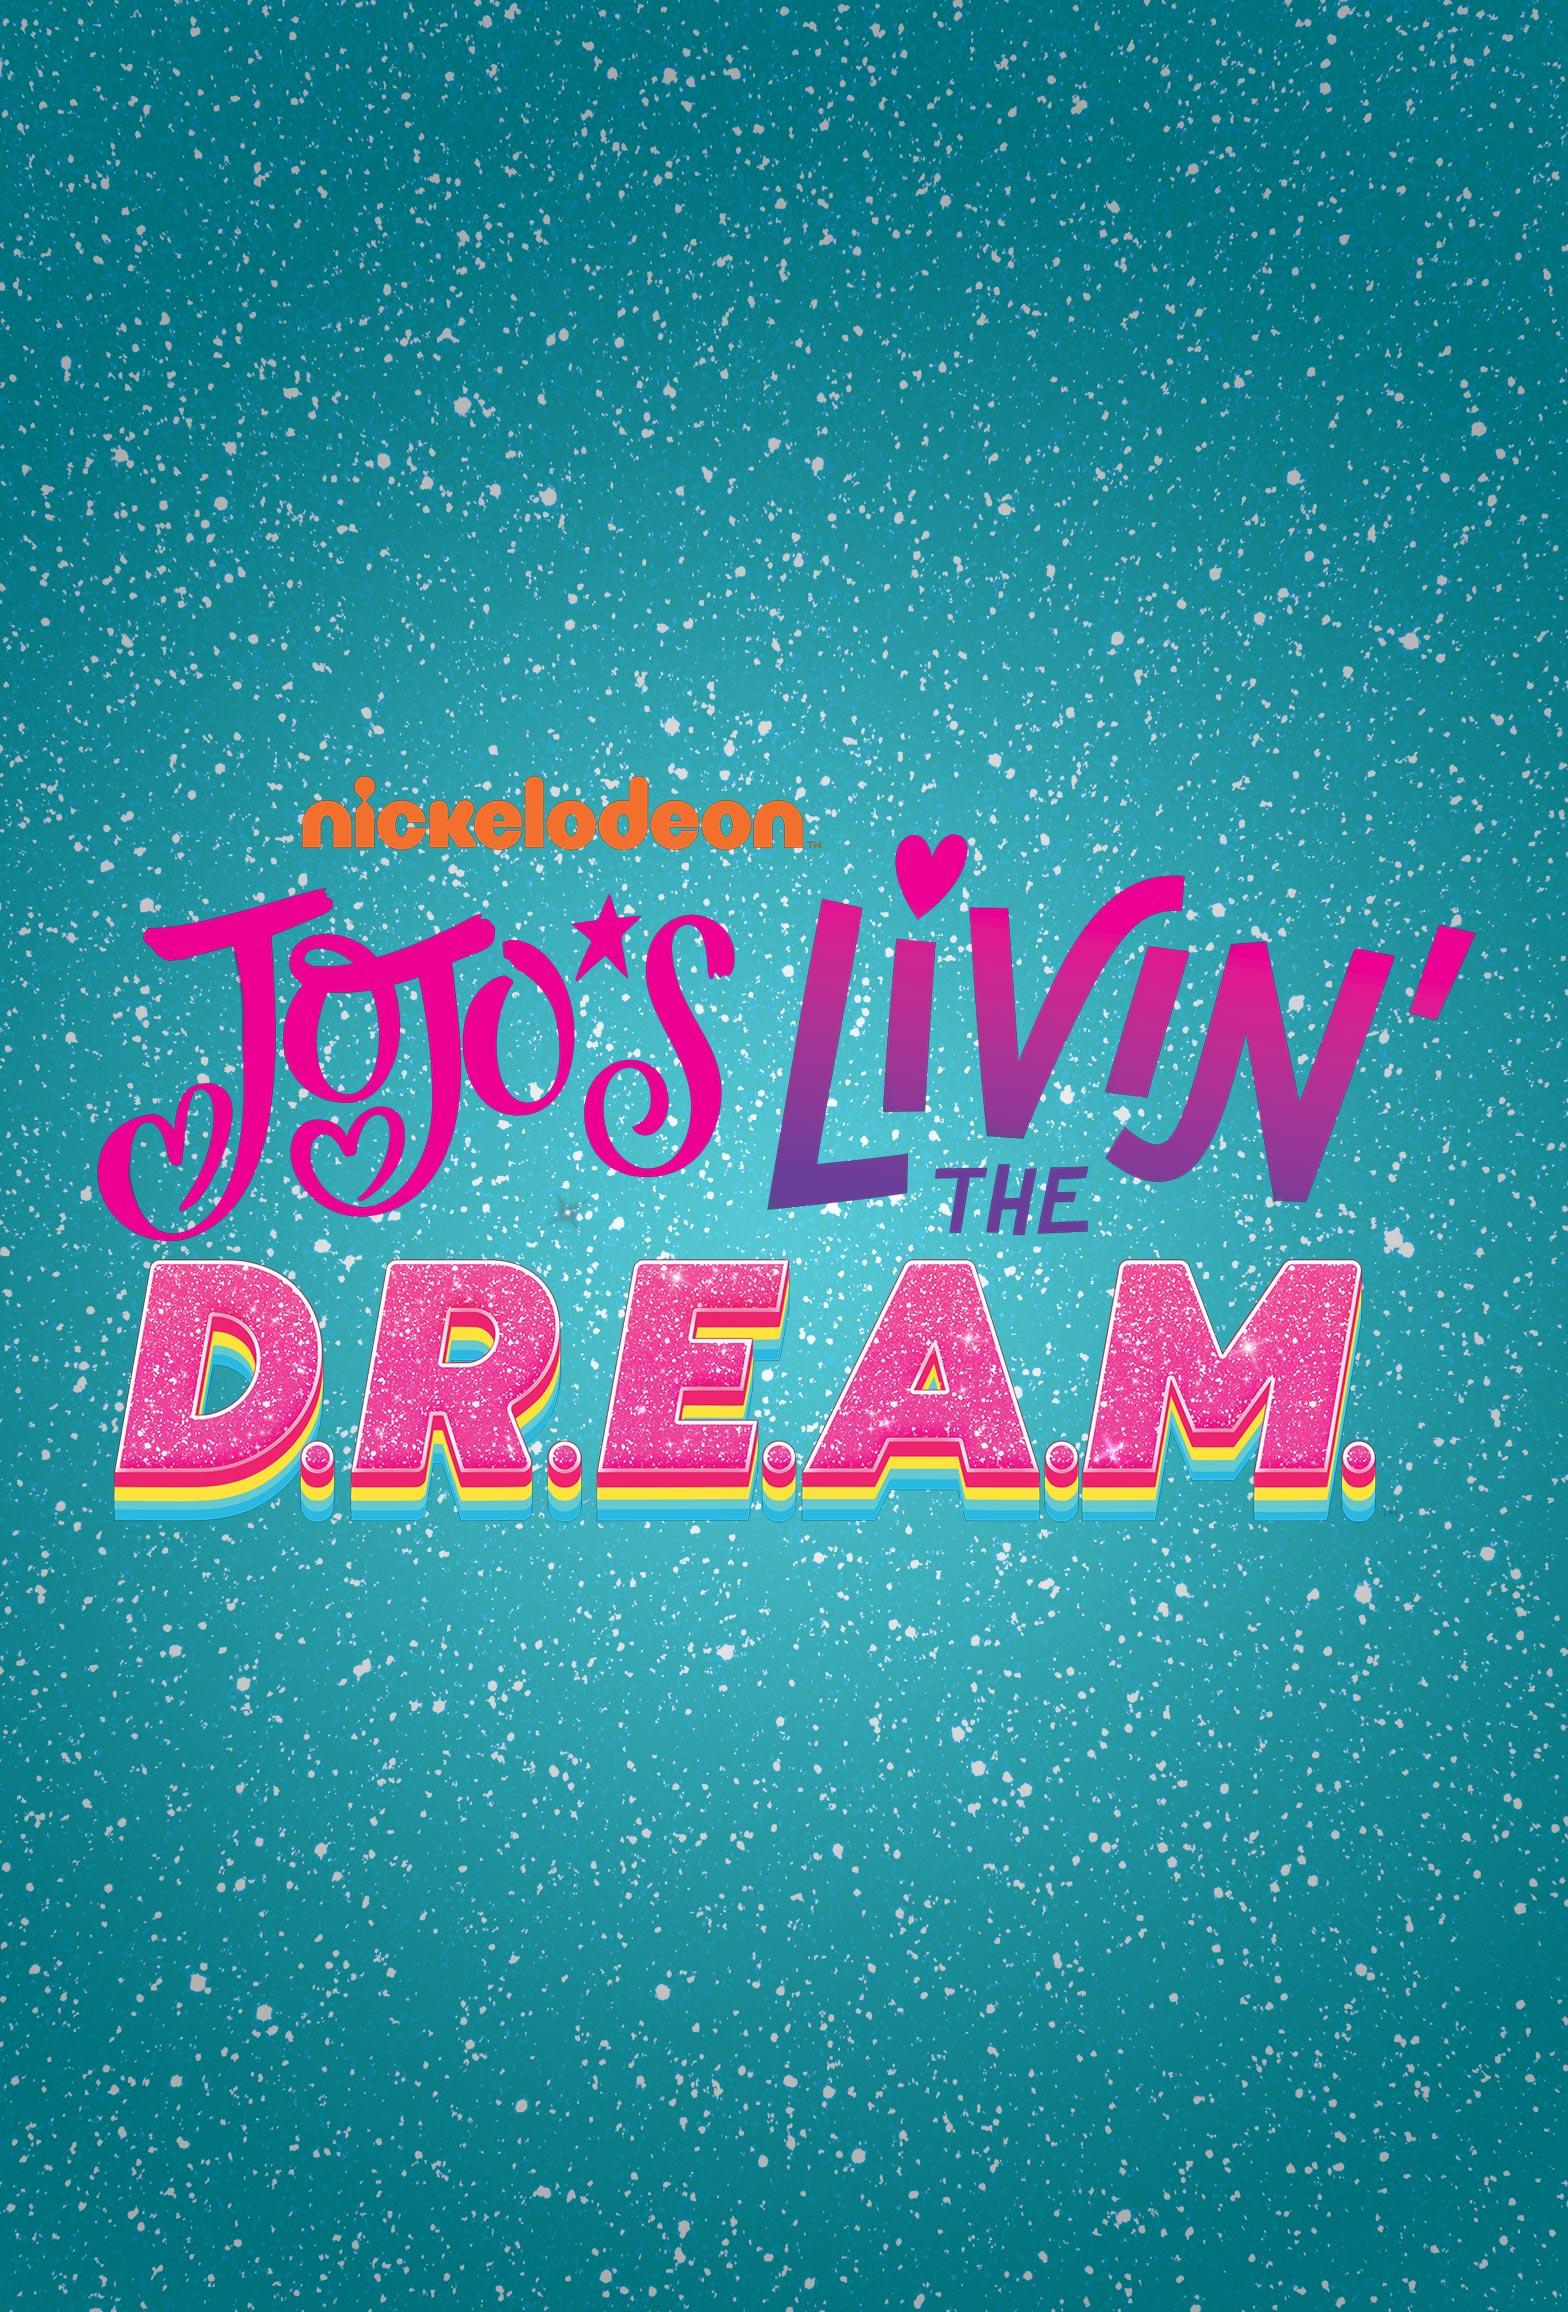 JoJo's Livin' the D.R.E.A.M. (TV Series 2019) IMDb